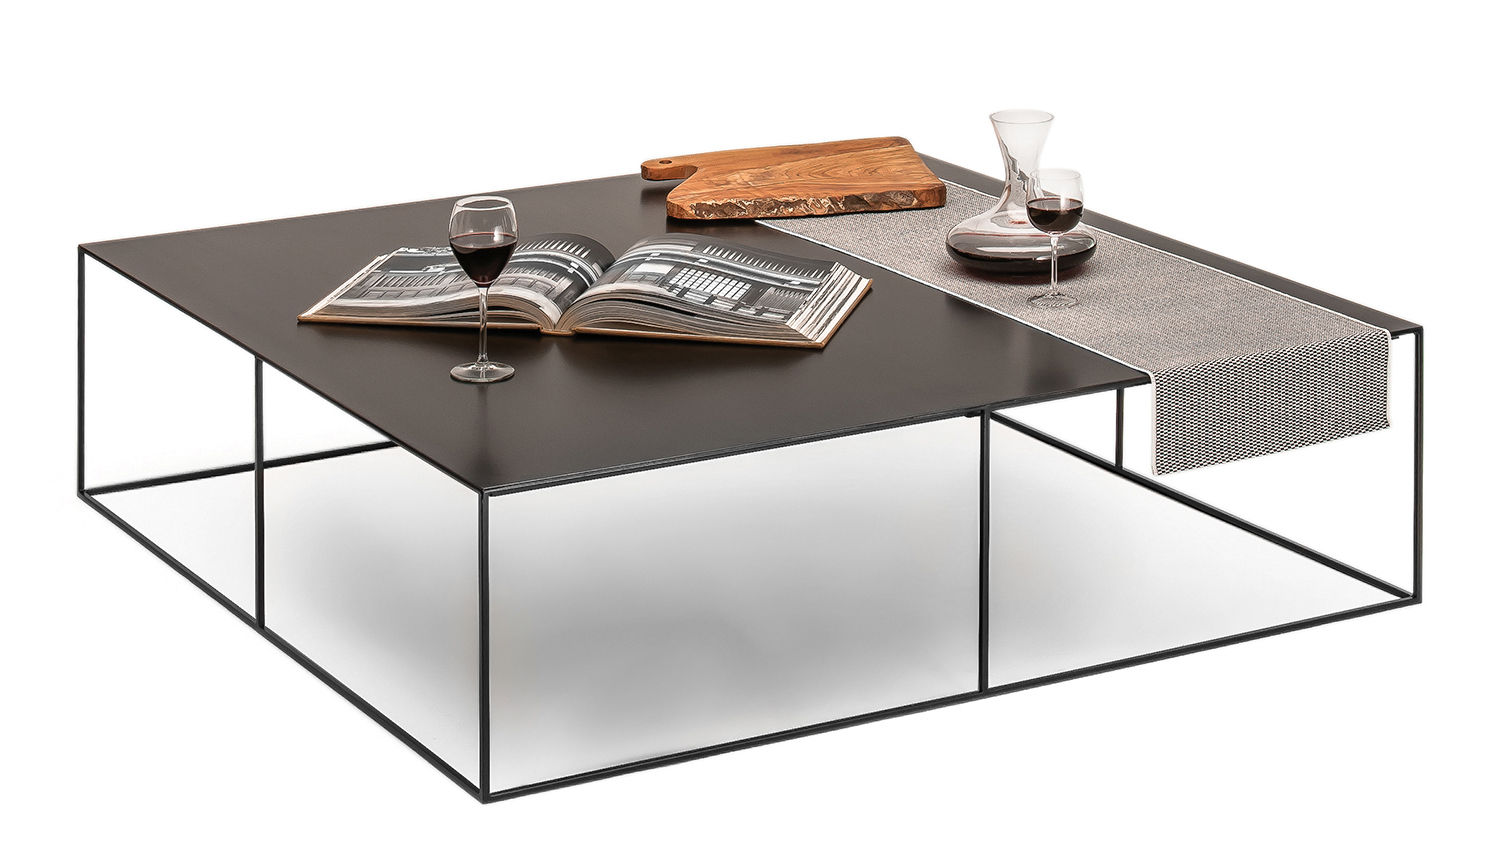 Slim Irony Coffee Table 124 X 124 Cm Black Copper By Zeus